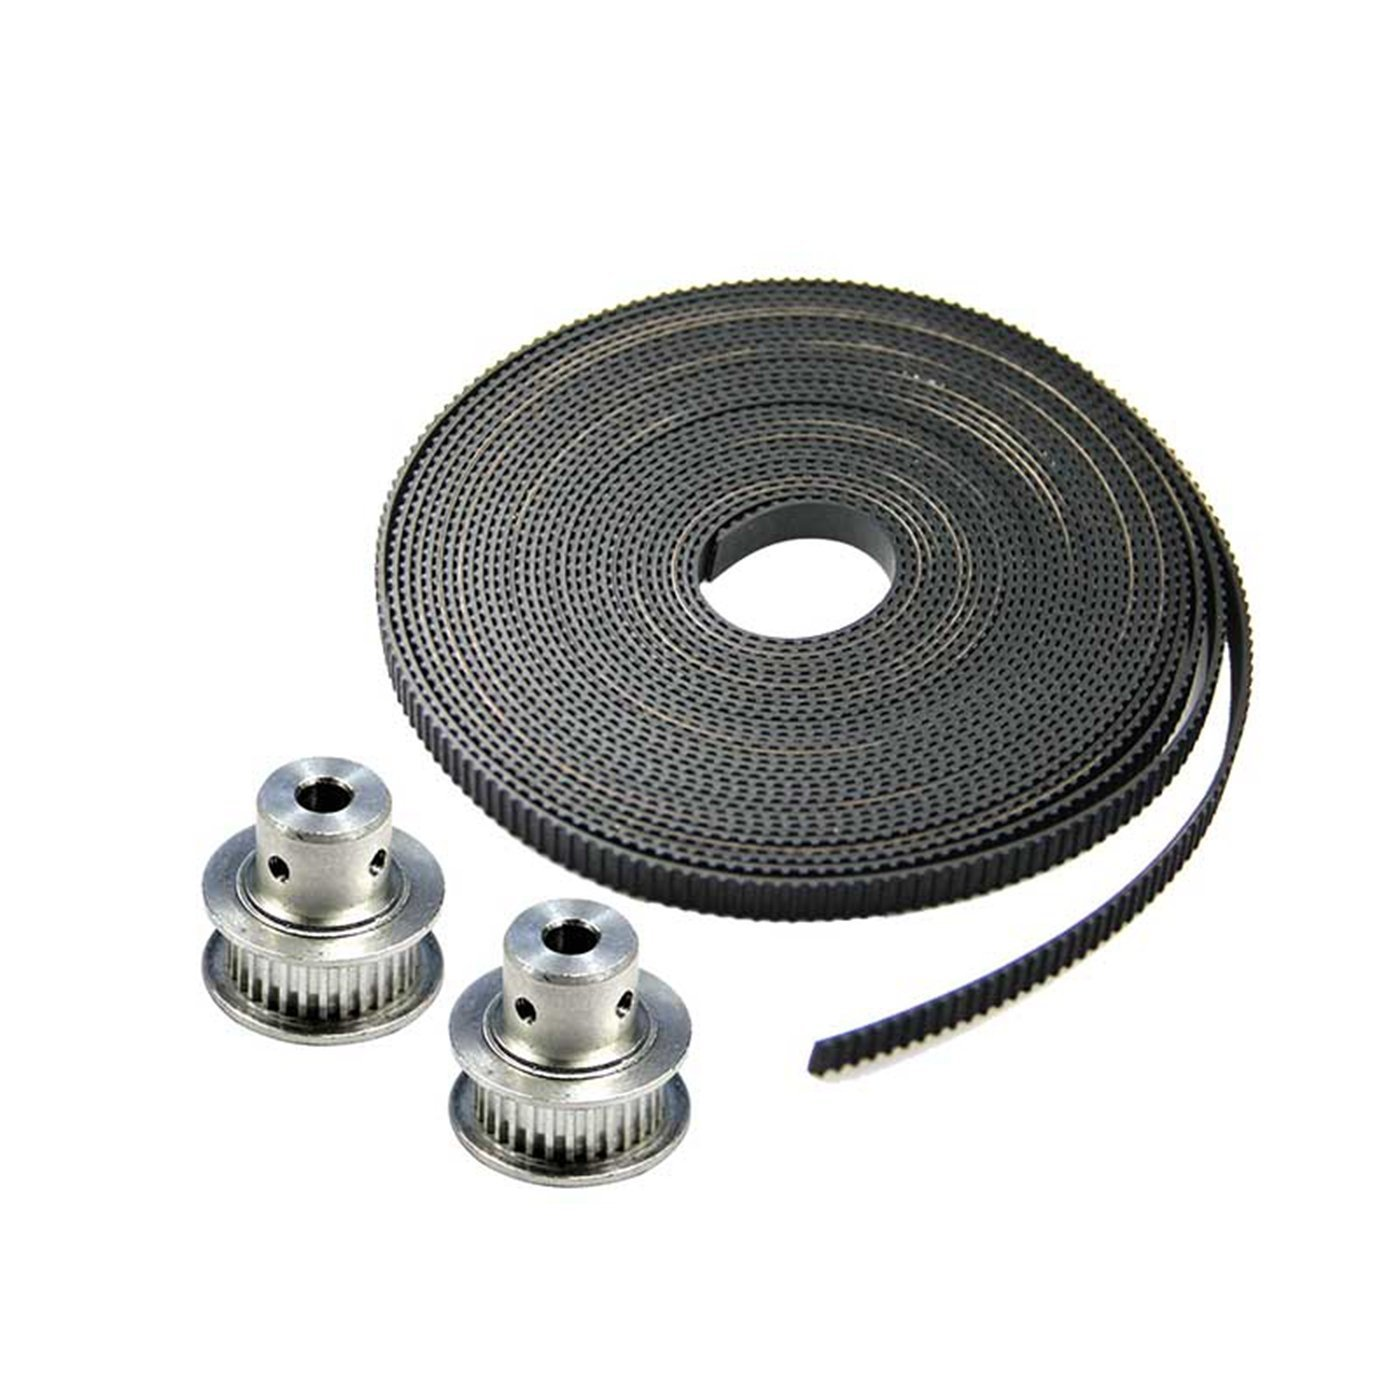 FEBNISCTE 10 Meters GT2 timing belt width 6mm Fit for RepRap Mendel Rostock Prusa GT2-6mm Belt FBMNU00432